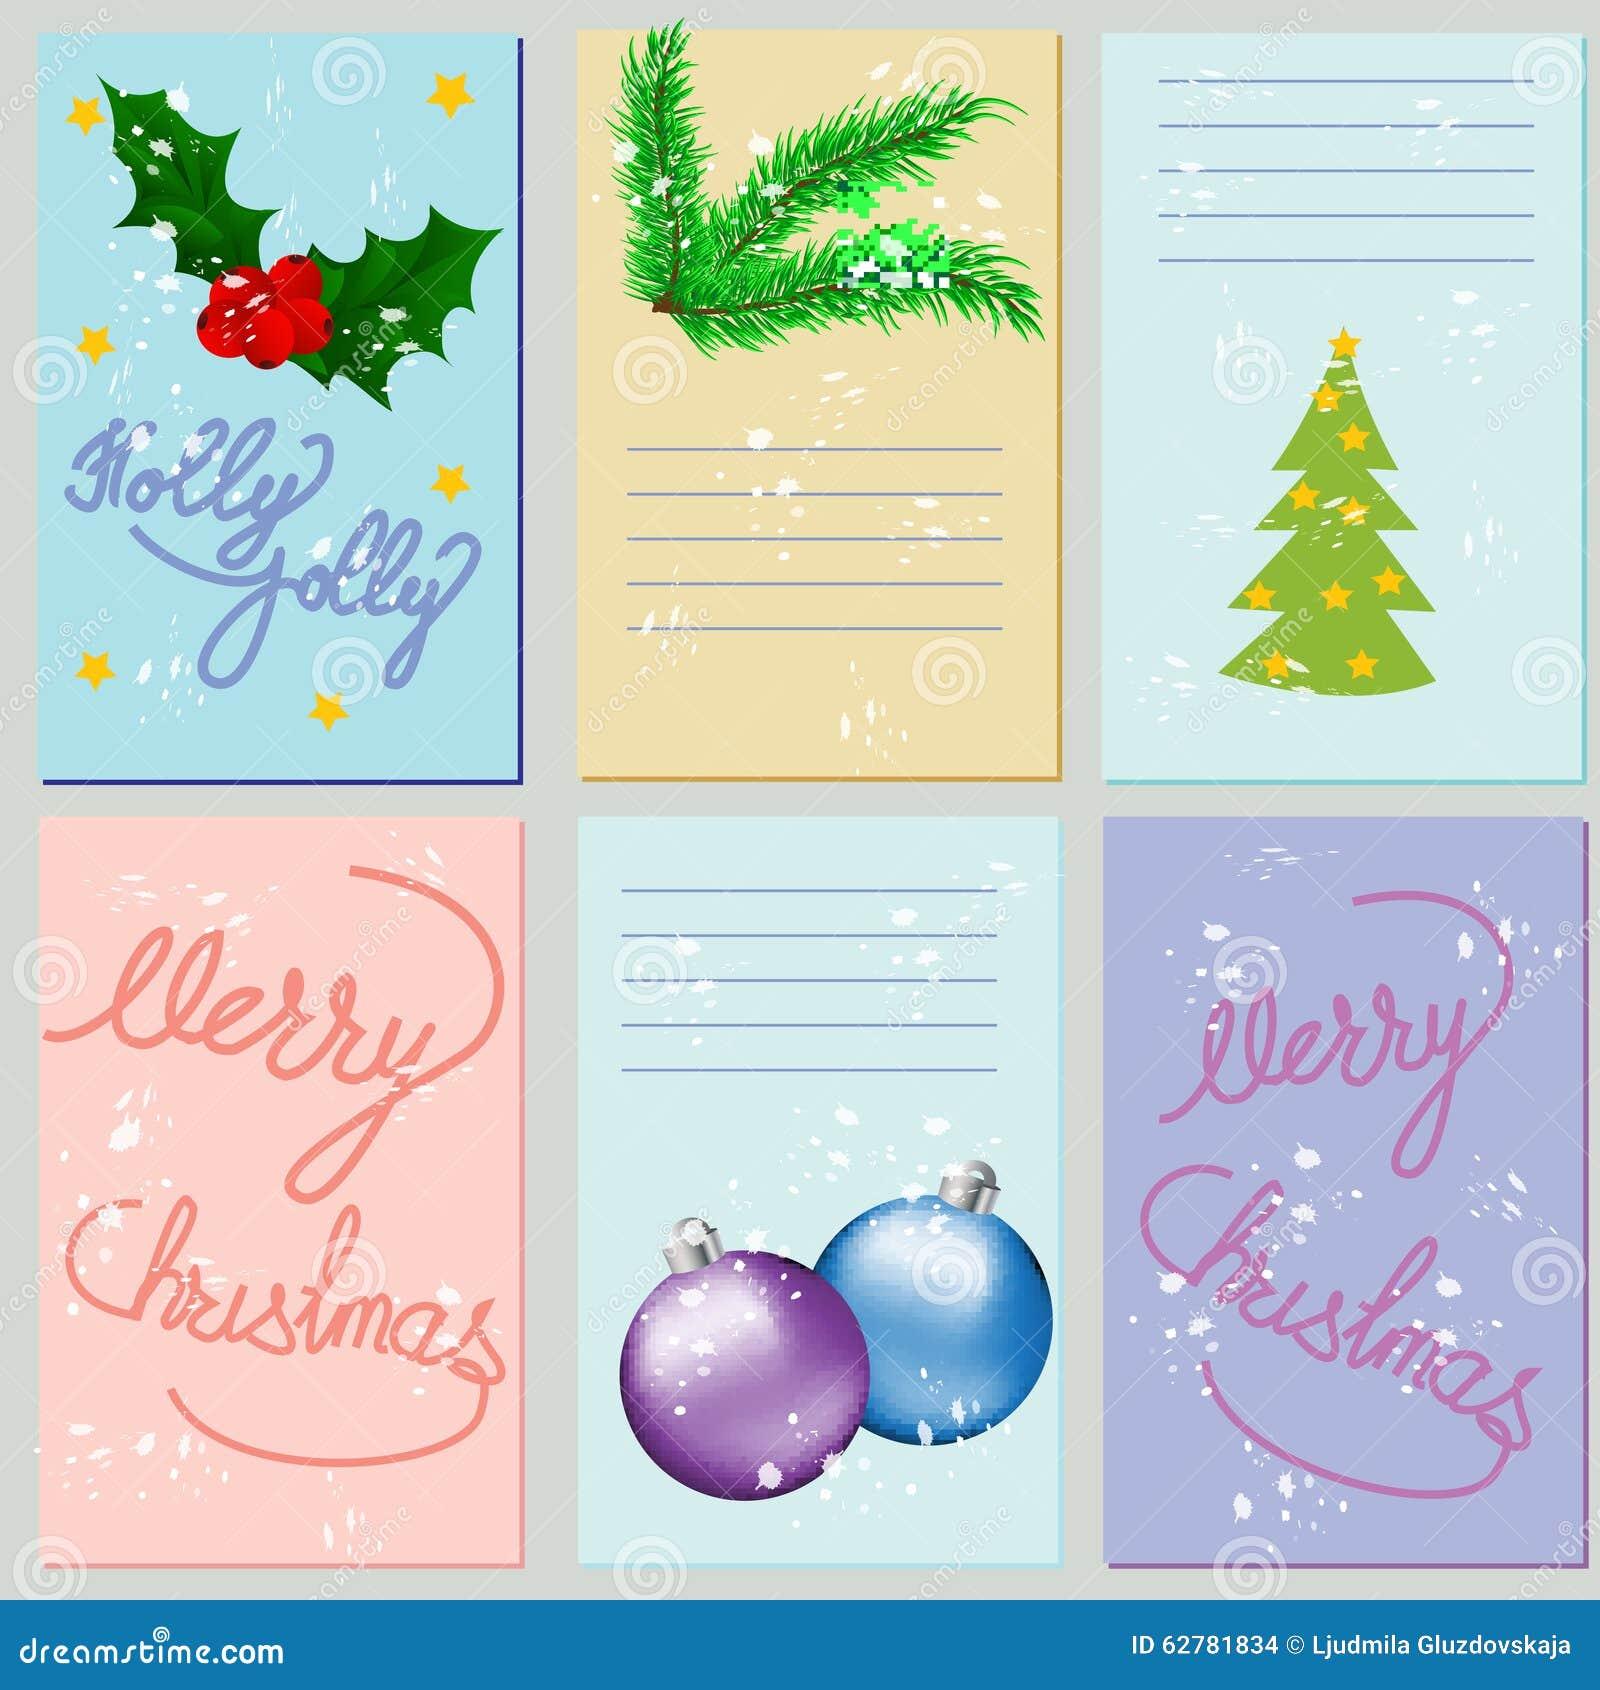 Collection Of 6 Christmas Card Templates Christmas Posters Set